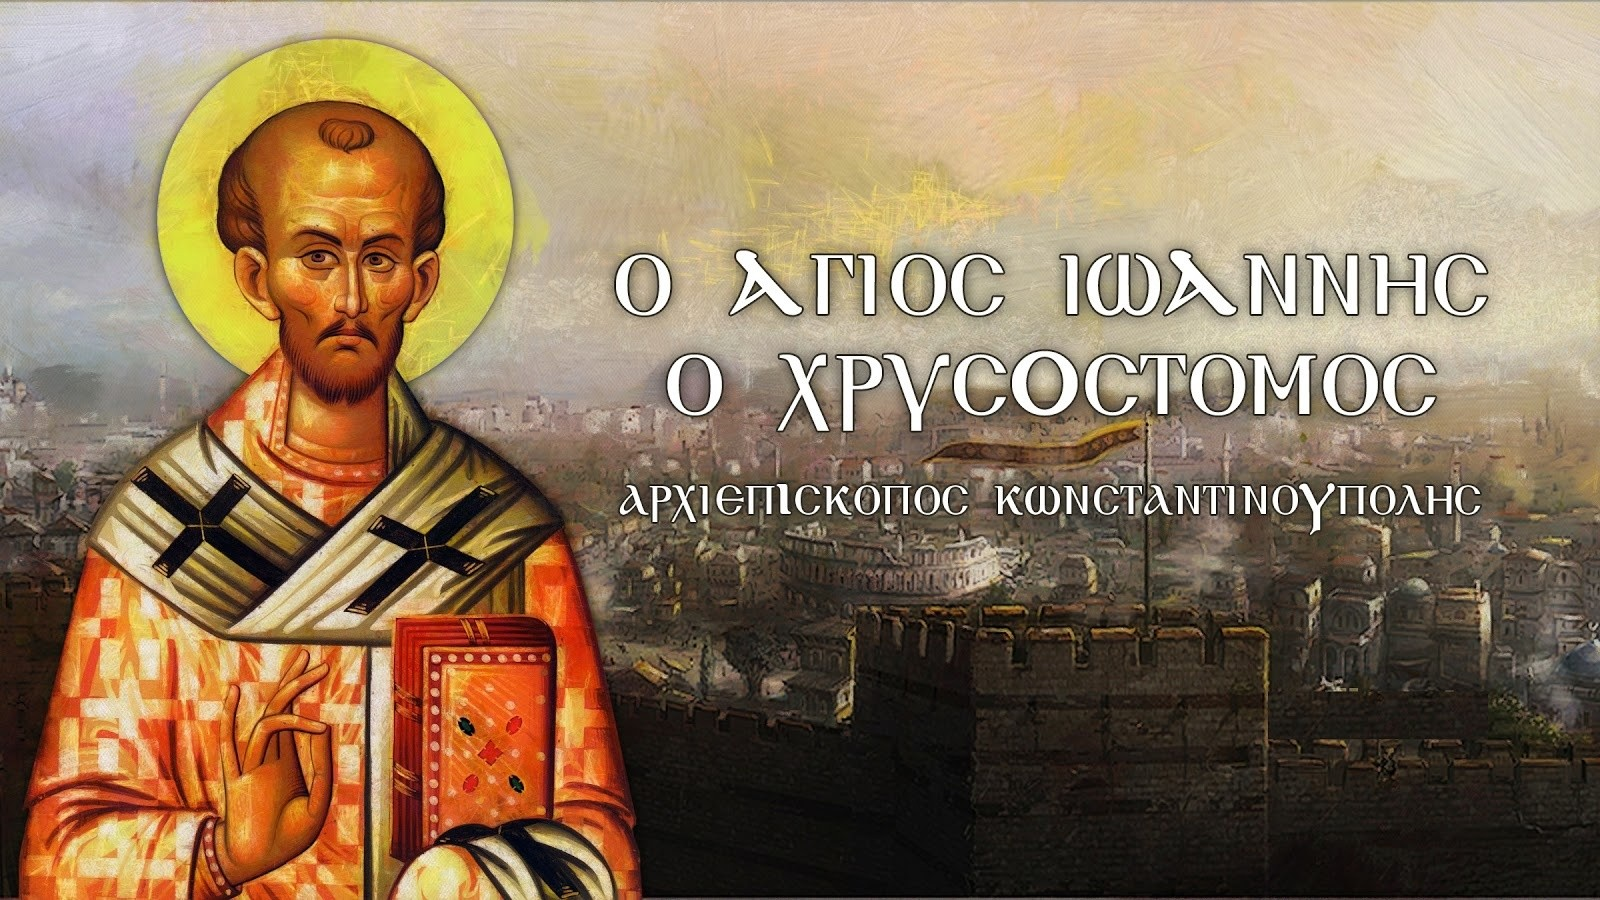 Read more about the article Ο άρτος που έγινε πέτρα! – Θαυμαστό γεγονός